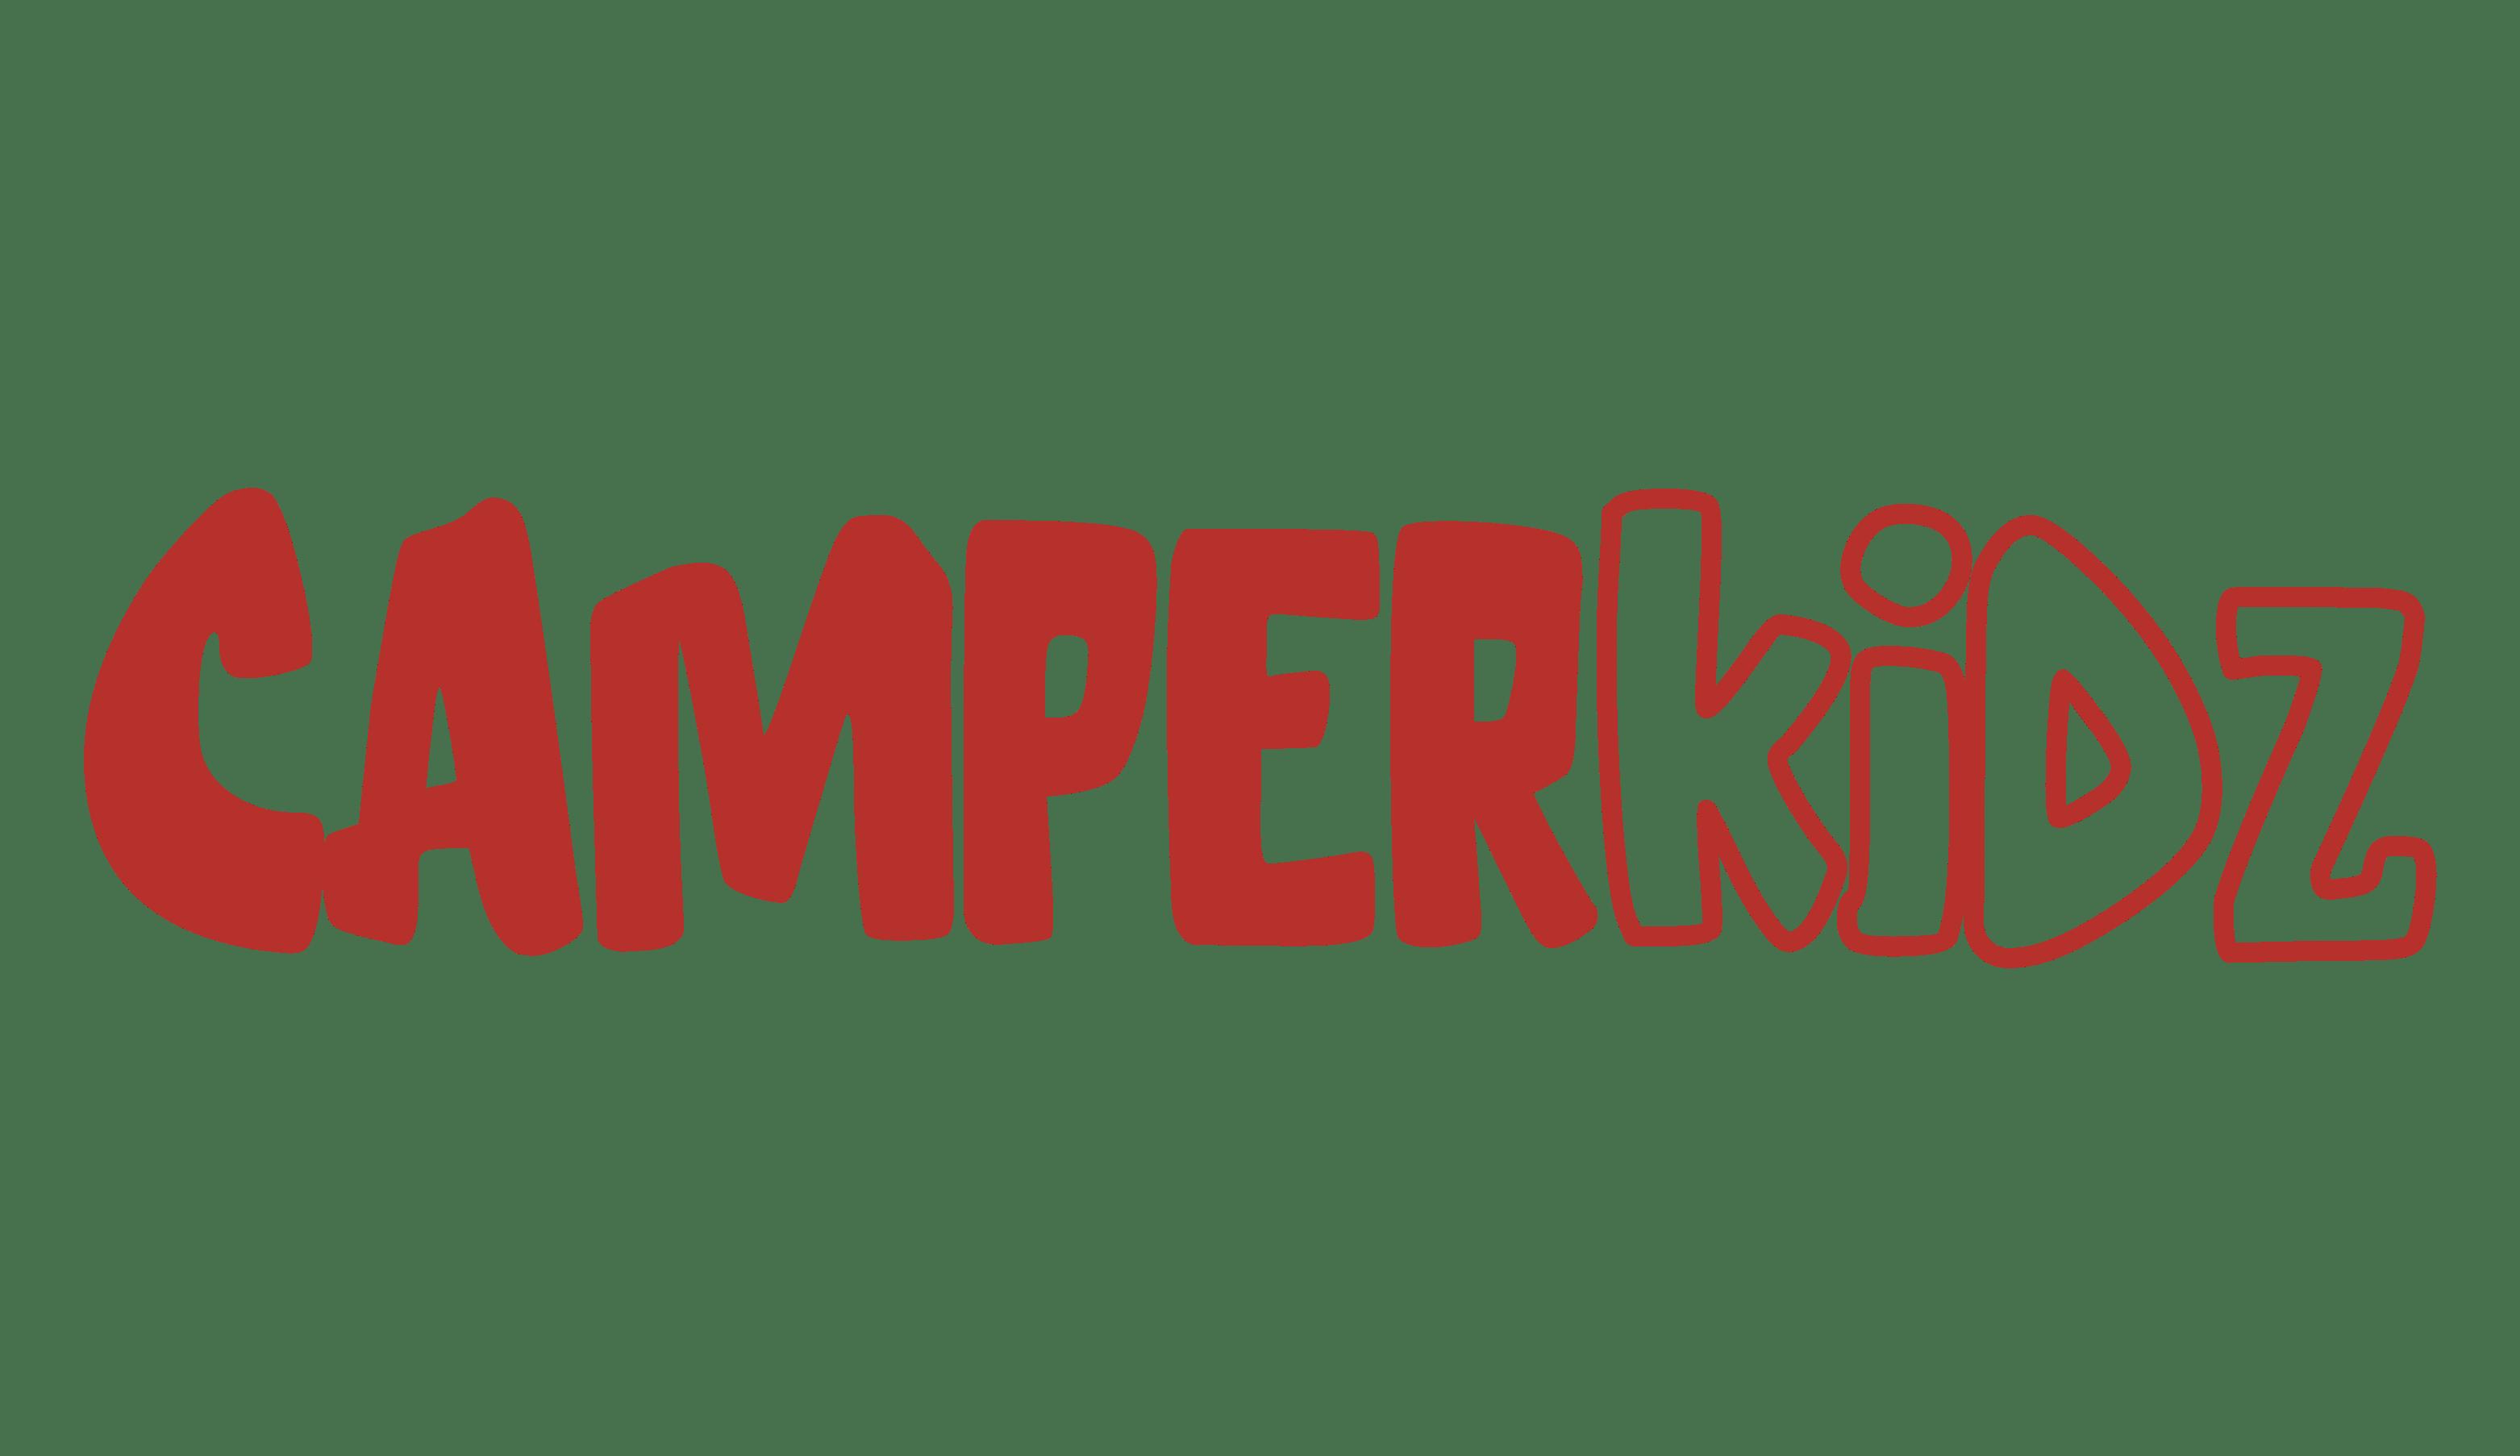 camperkidz